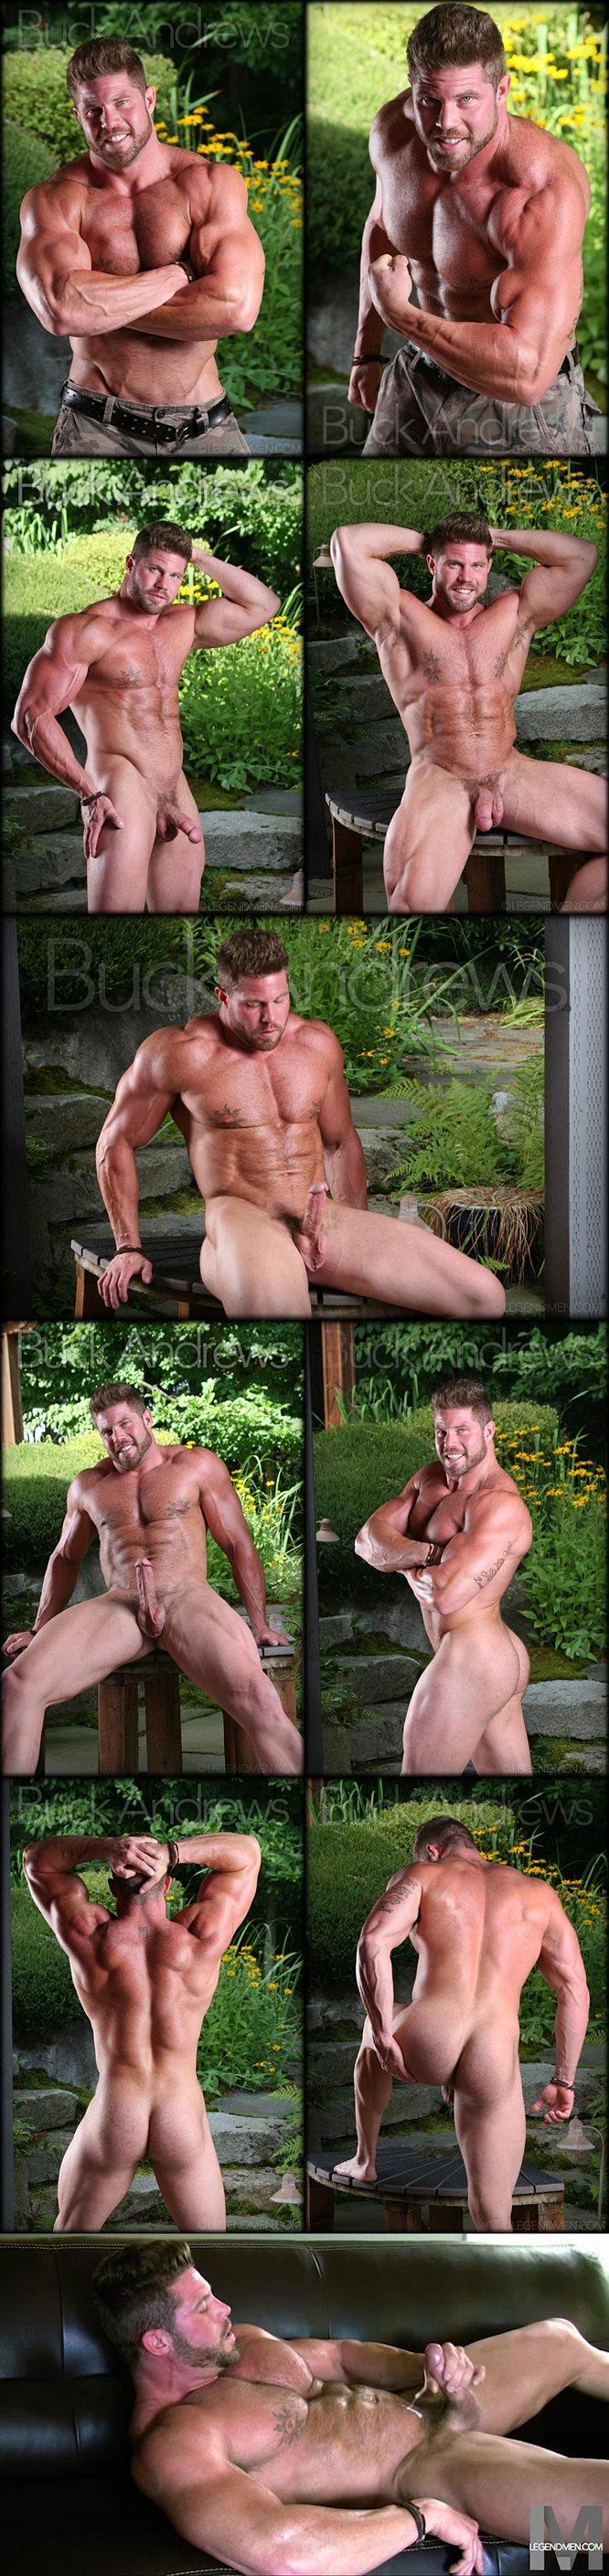 Masculine beefy stud Buck Andrews shoots a thick load at Legendmen